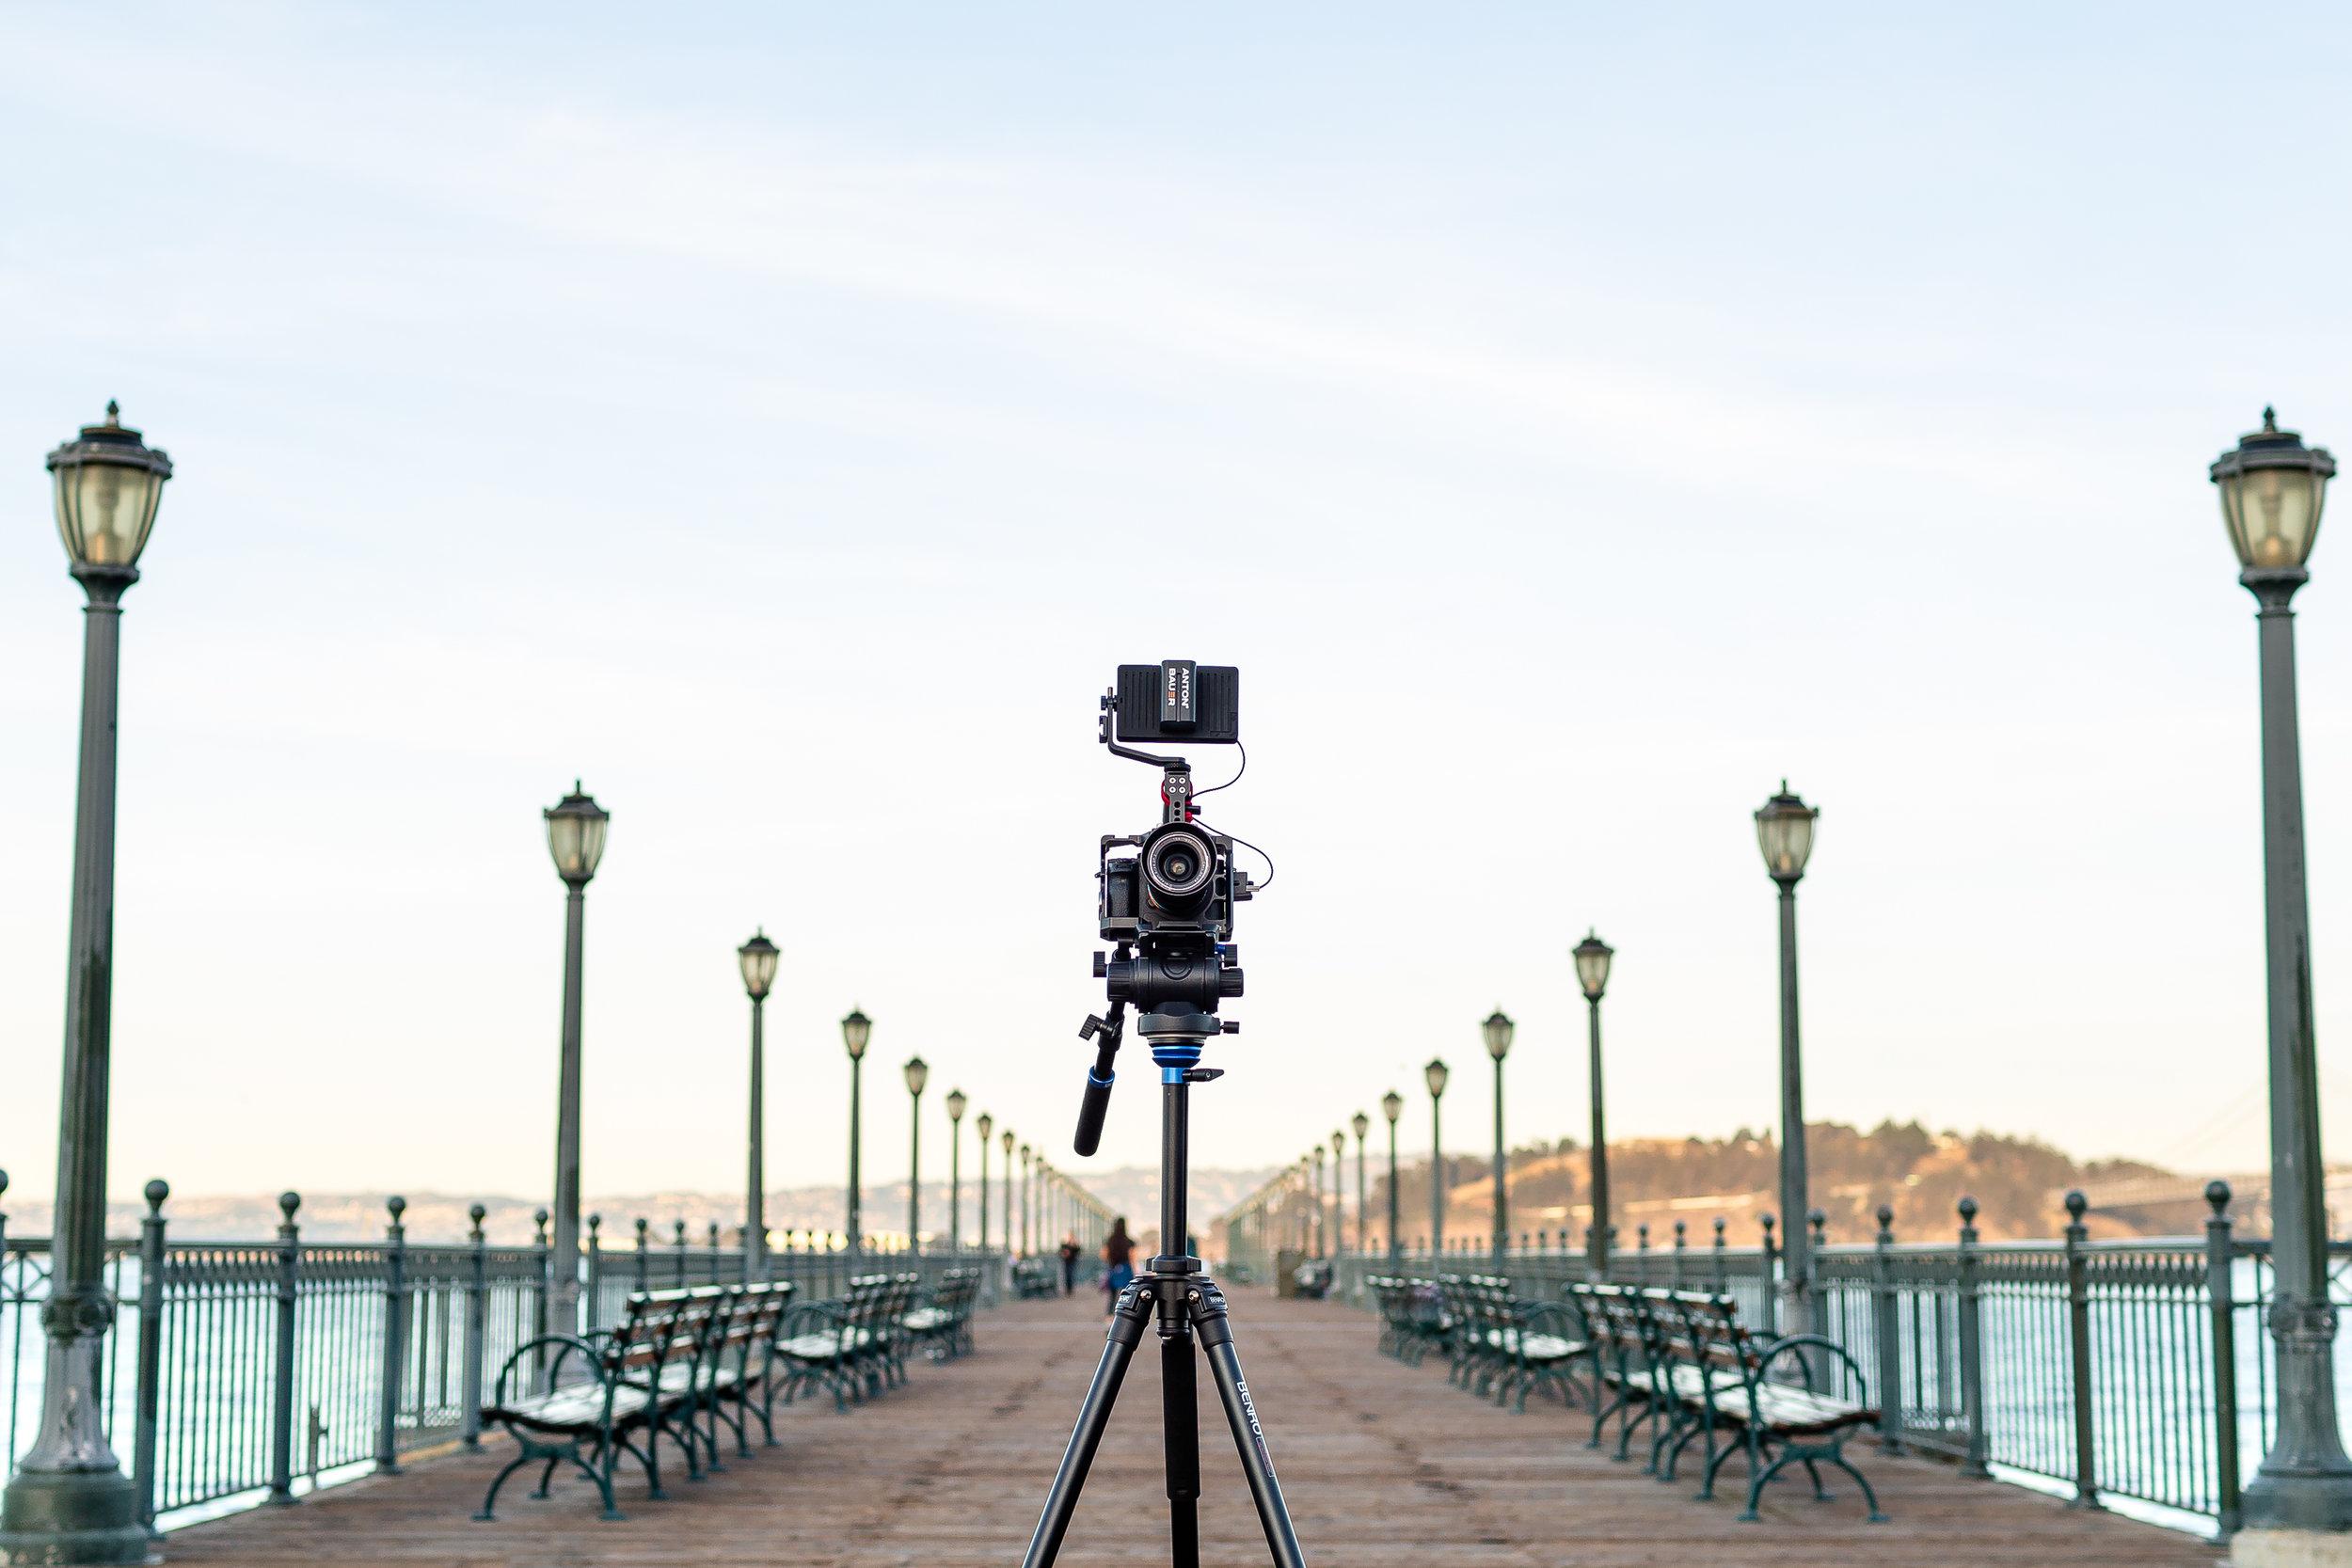 sony_a7sii_kit_videographer_mike_libunao